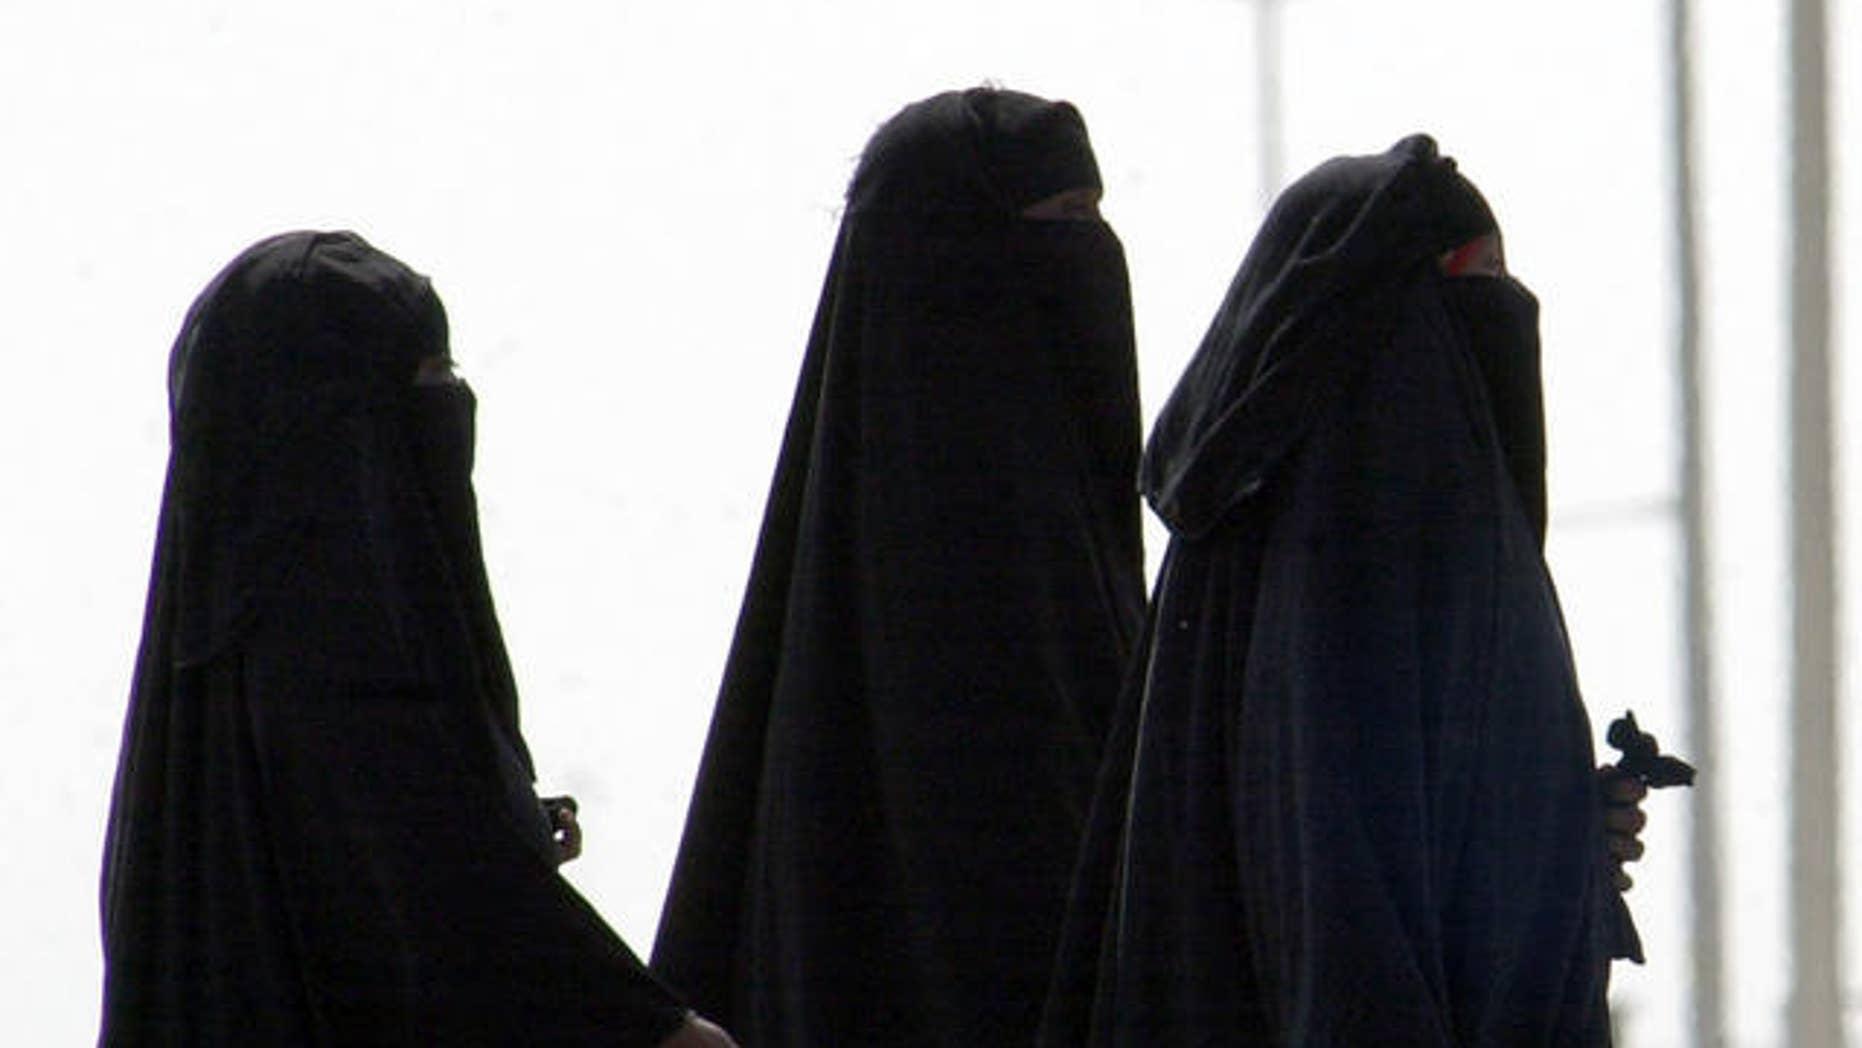 2006 FILE photo of unidentified Saudi women walking along a suburban street in Riyadh, Saudi Arabia.